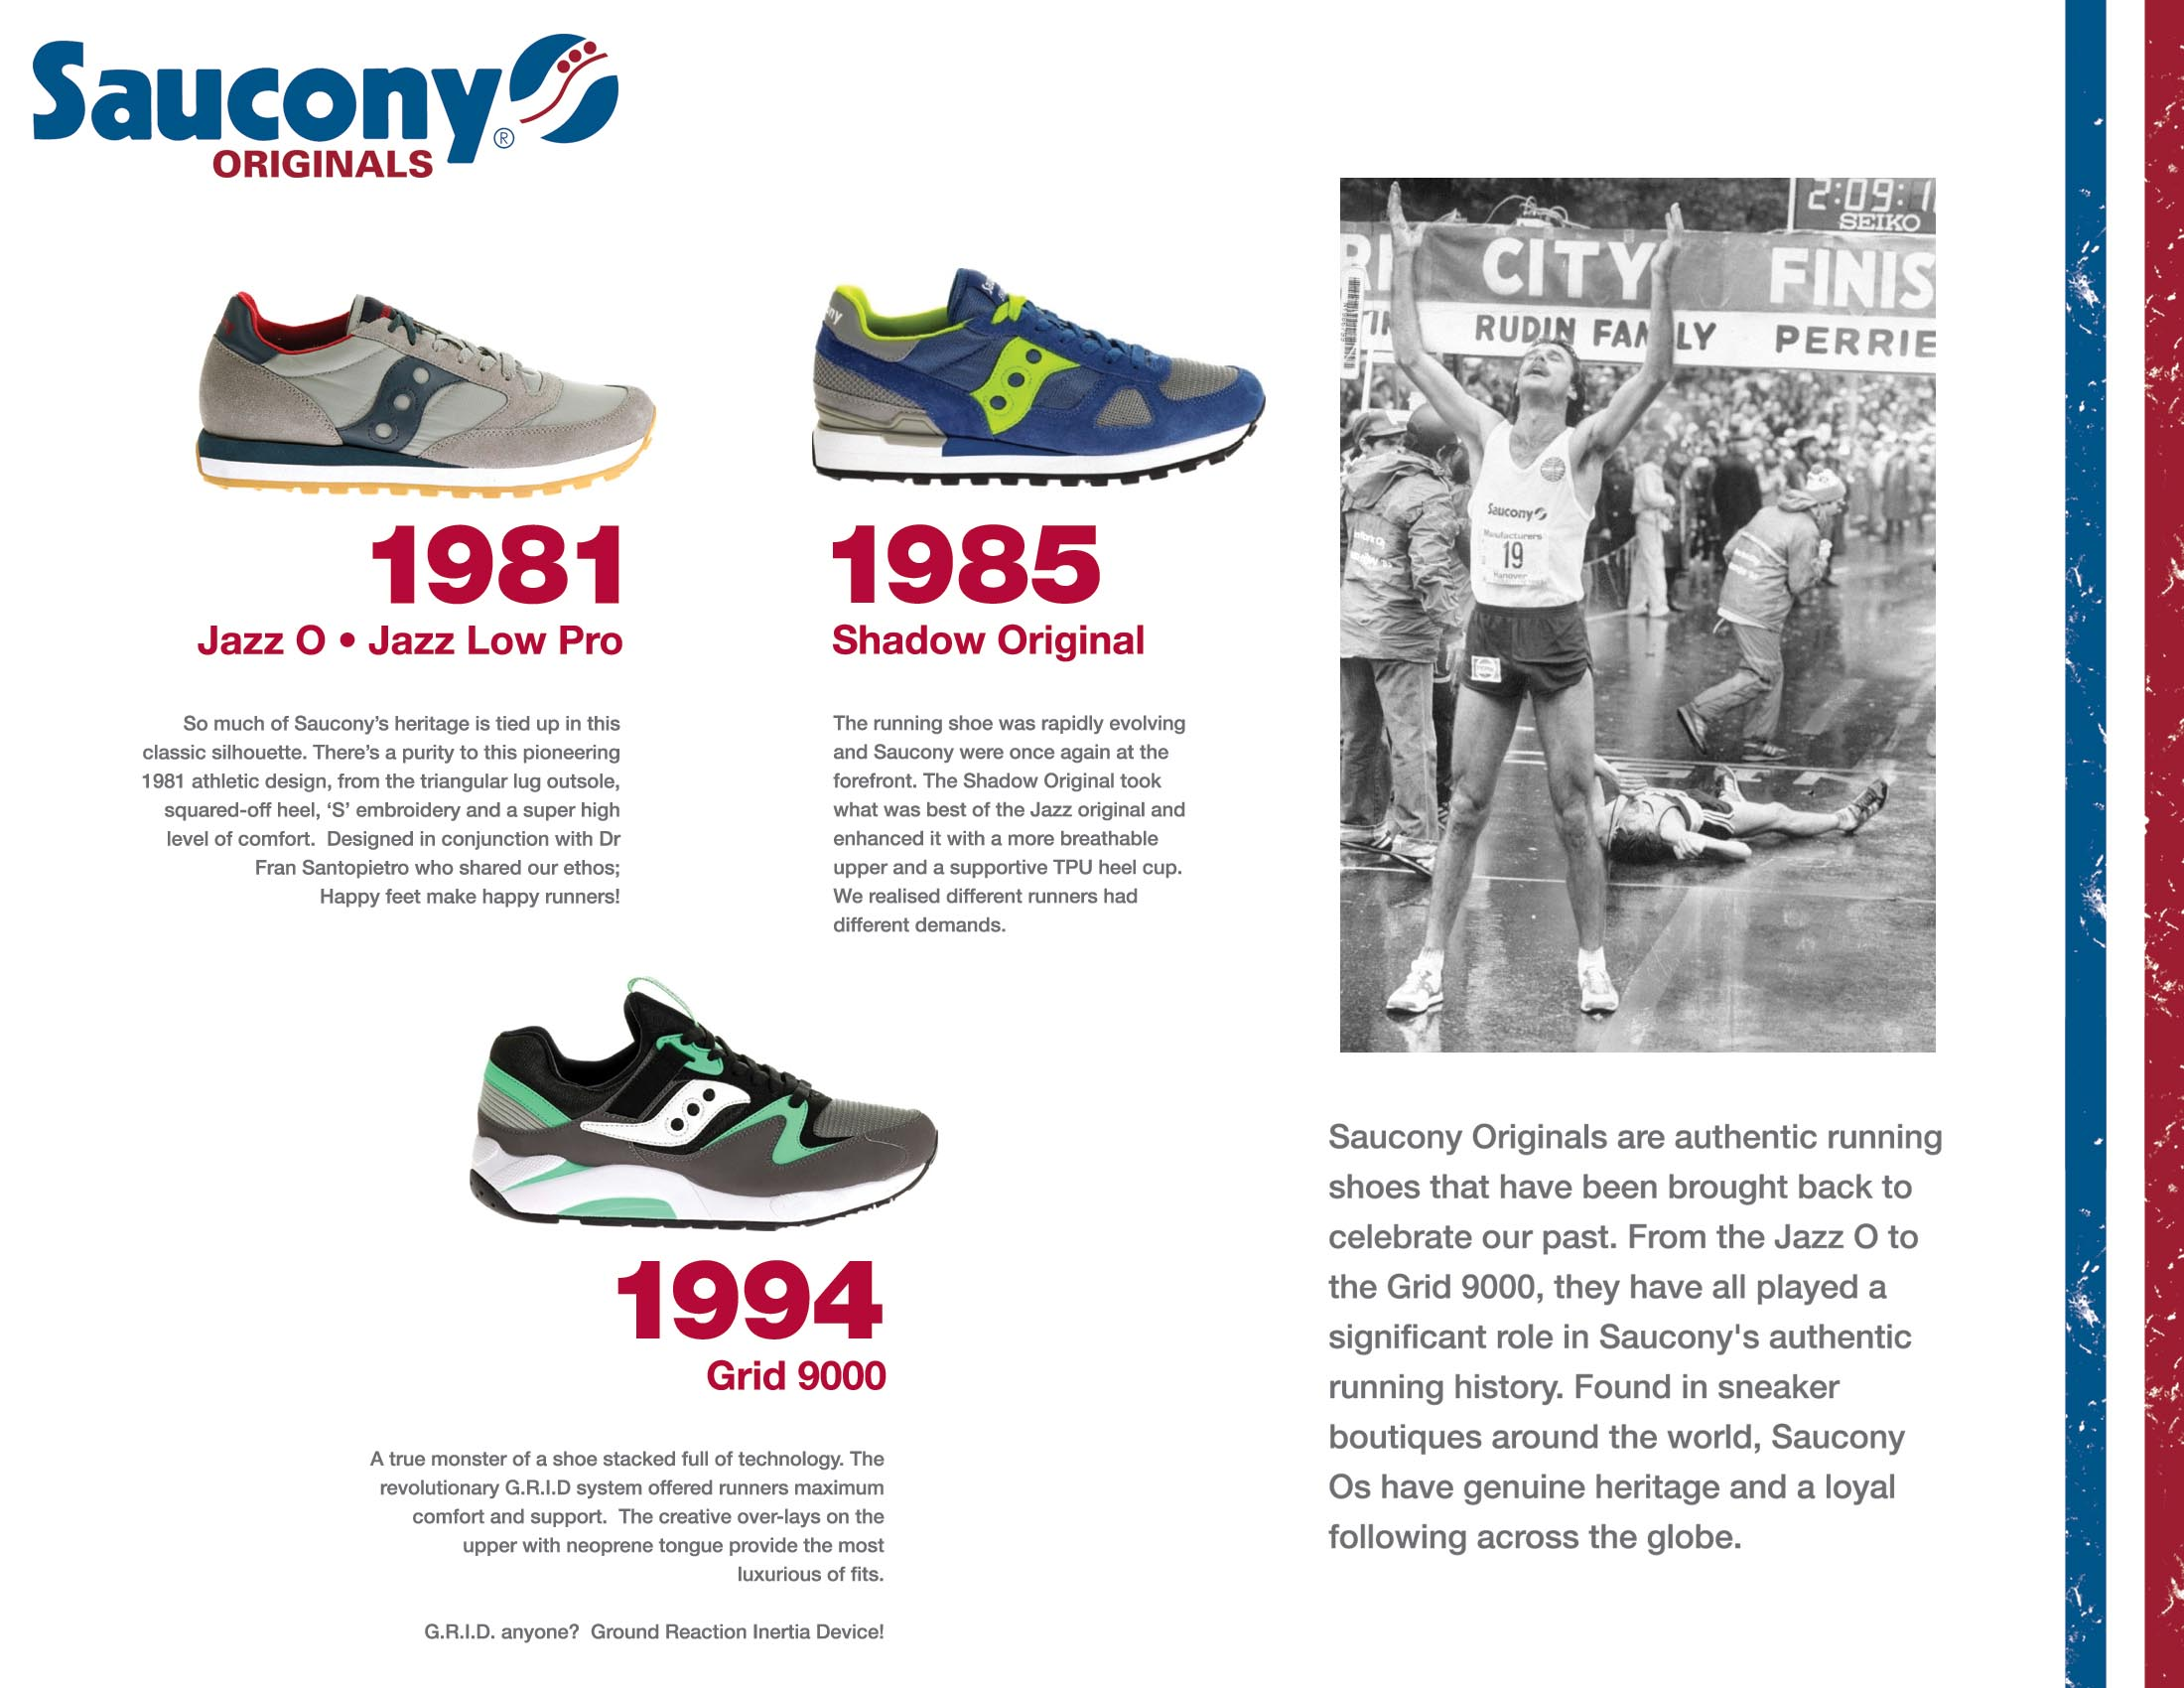 Saucony Originals Timeline